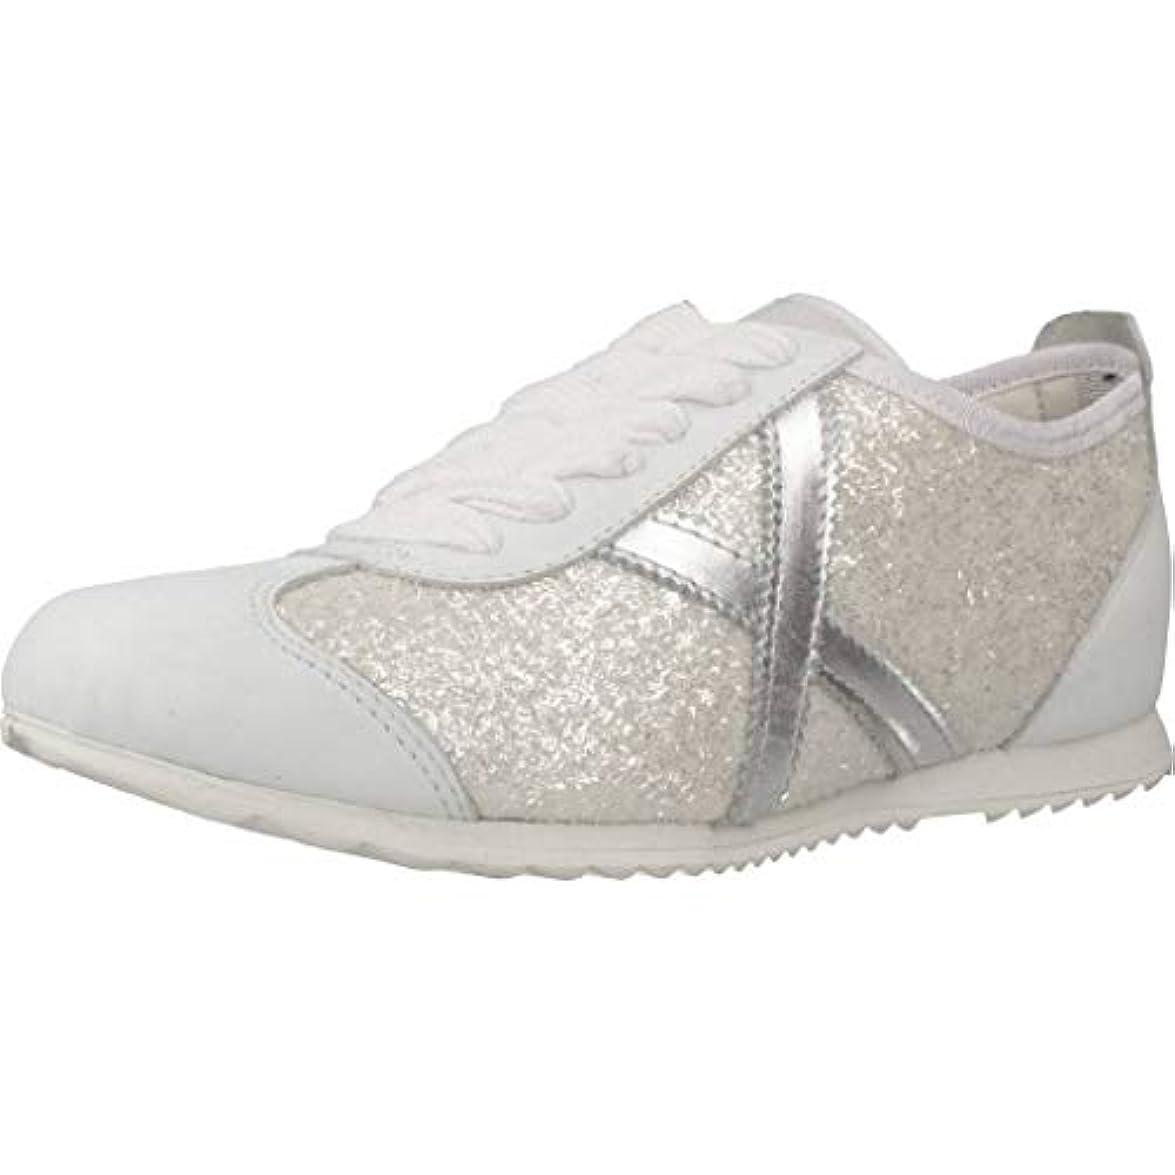 Munich Osaka 373 Sneakers Bianco Per Donna